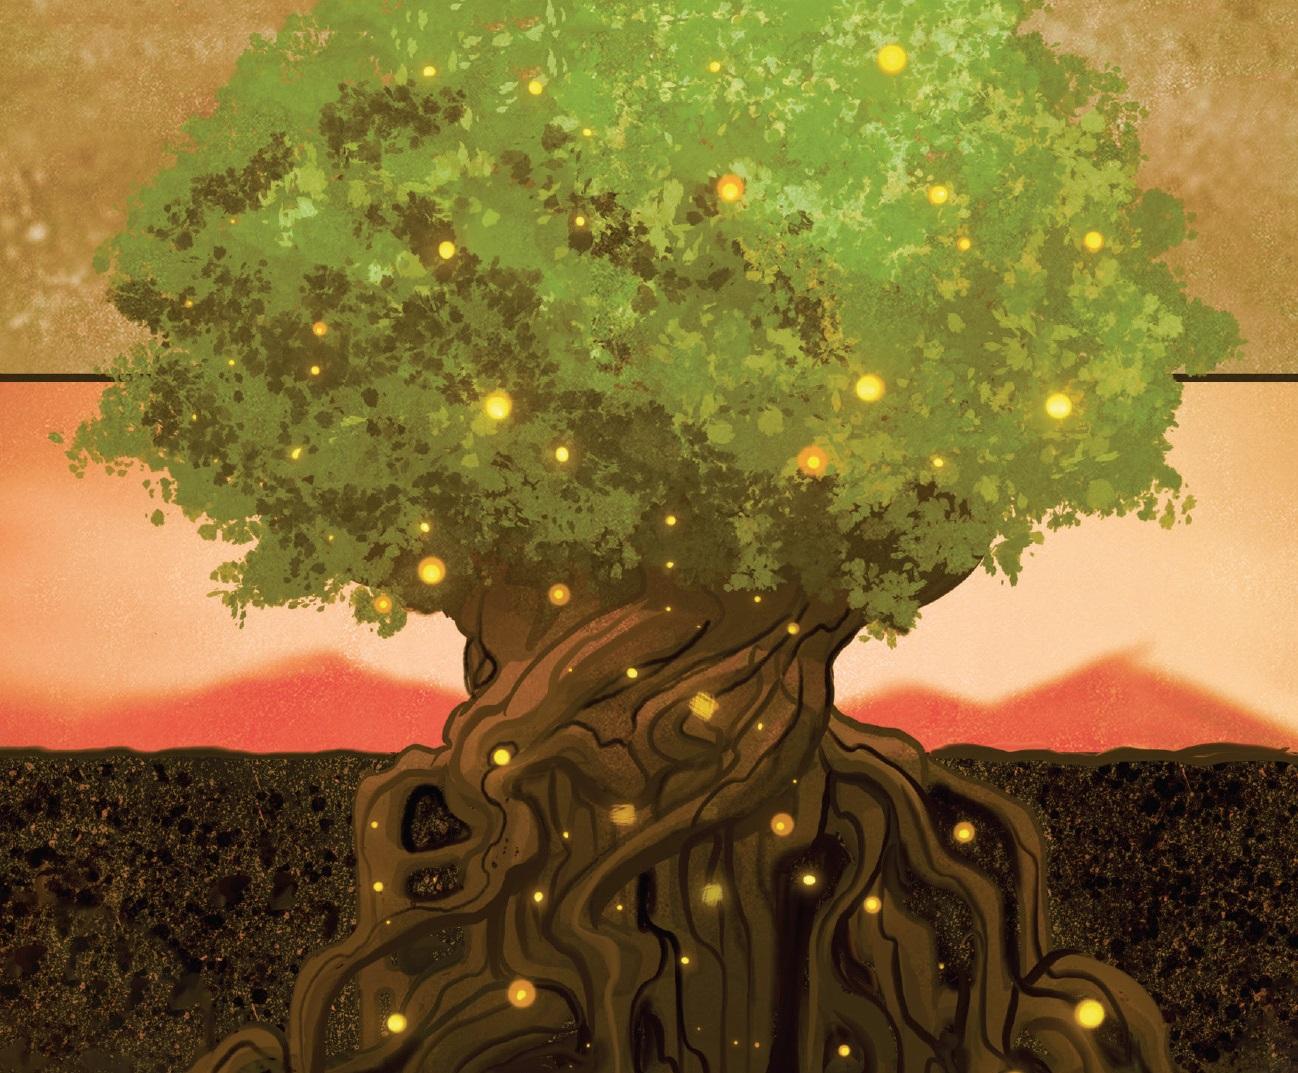 Watchtower Tree/Gallery